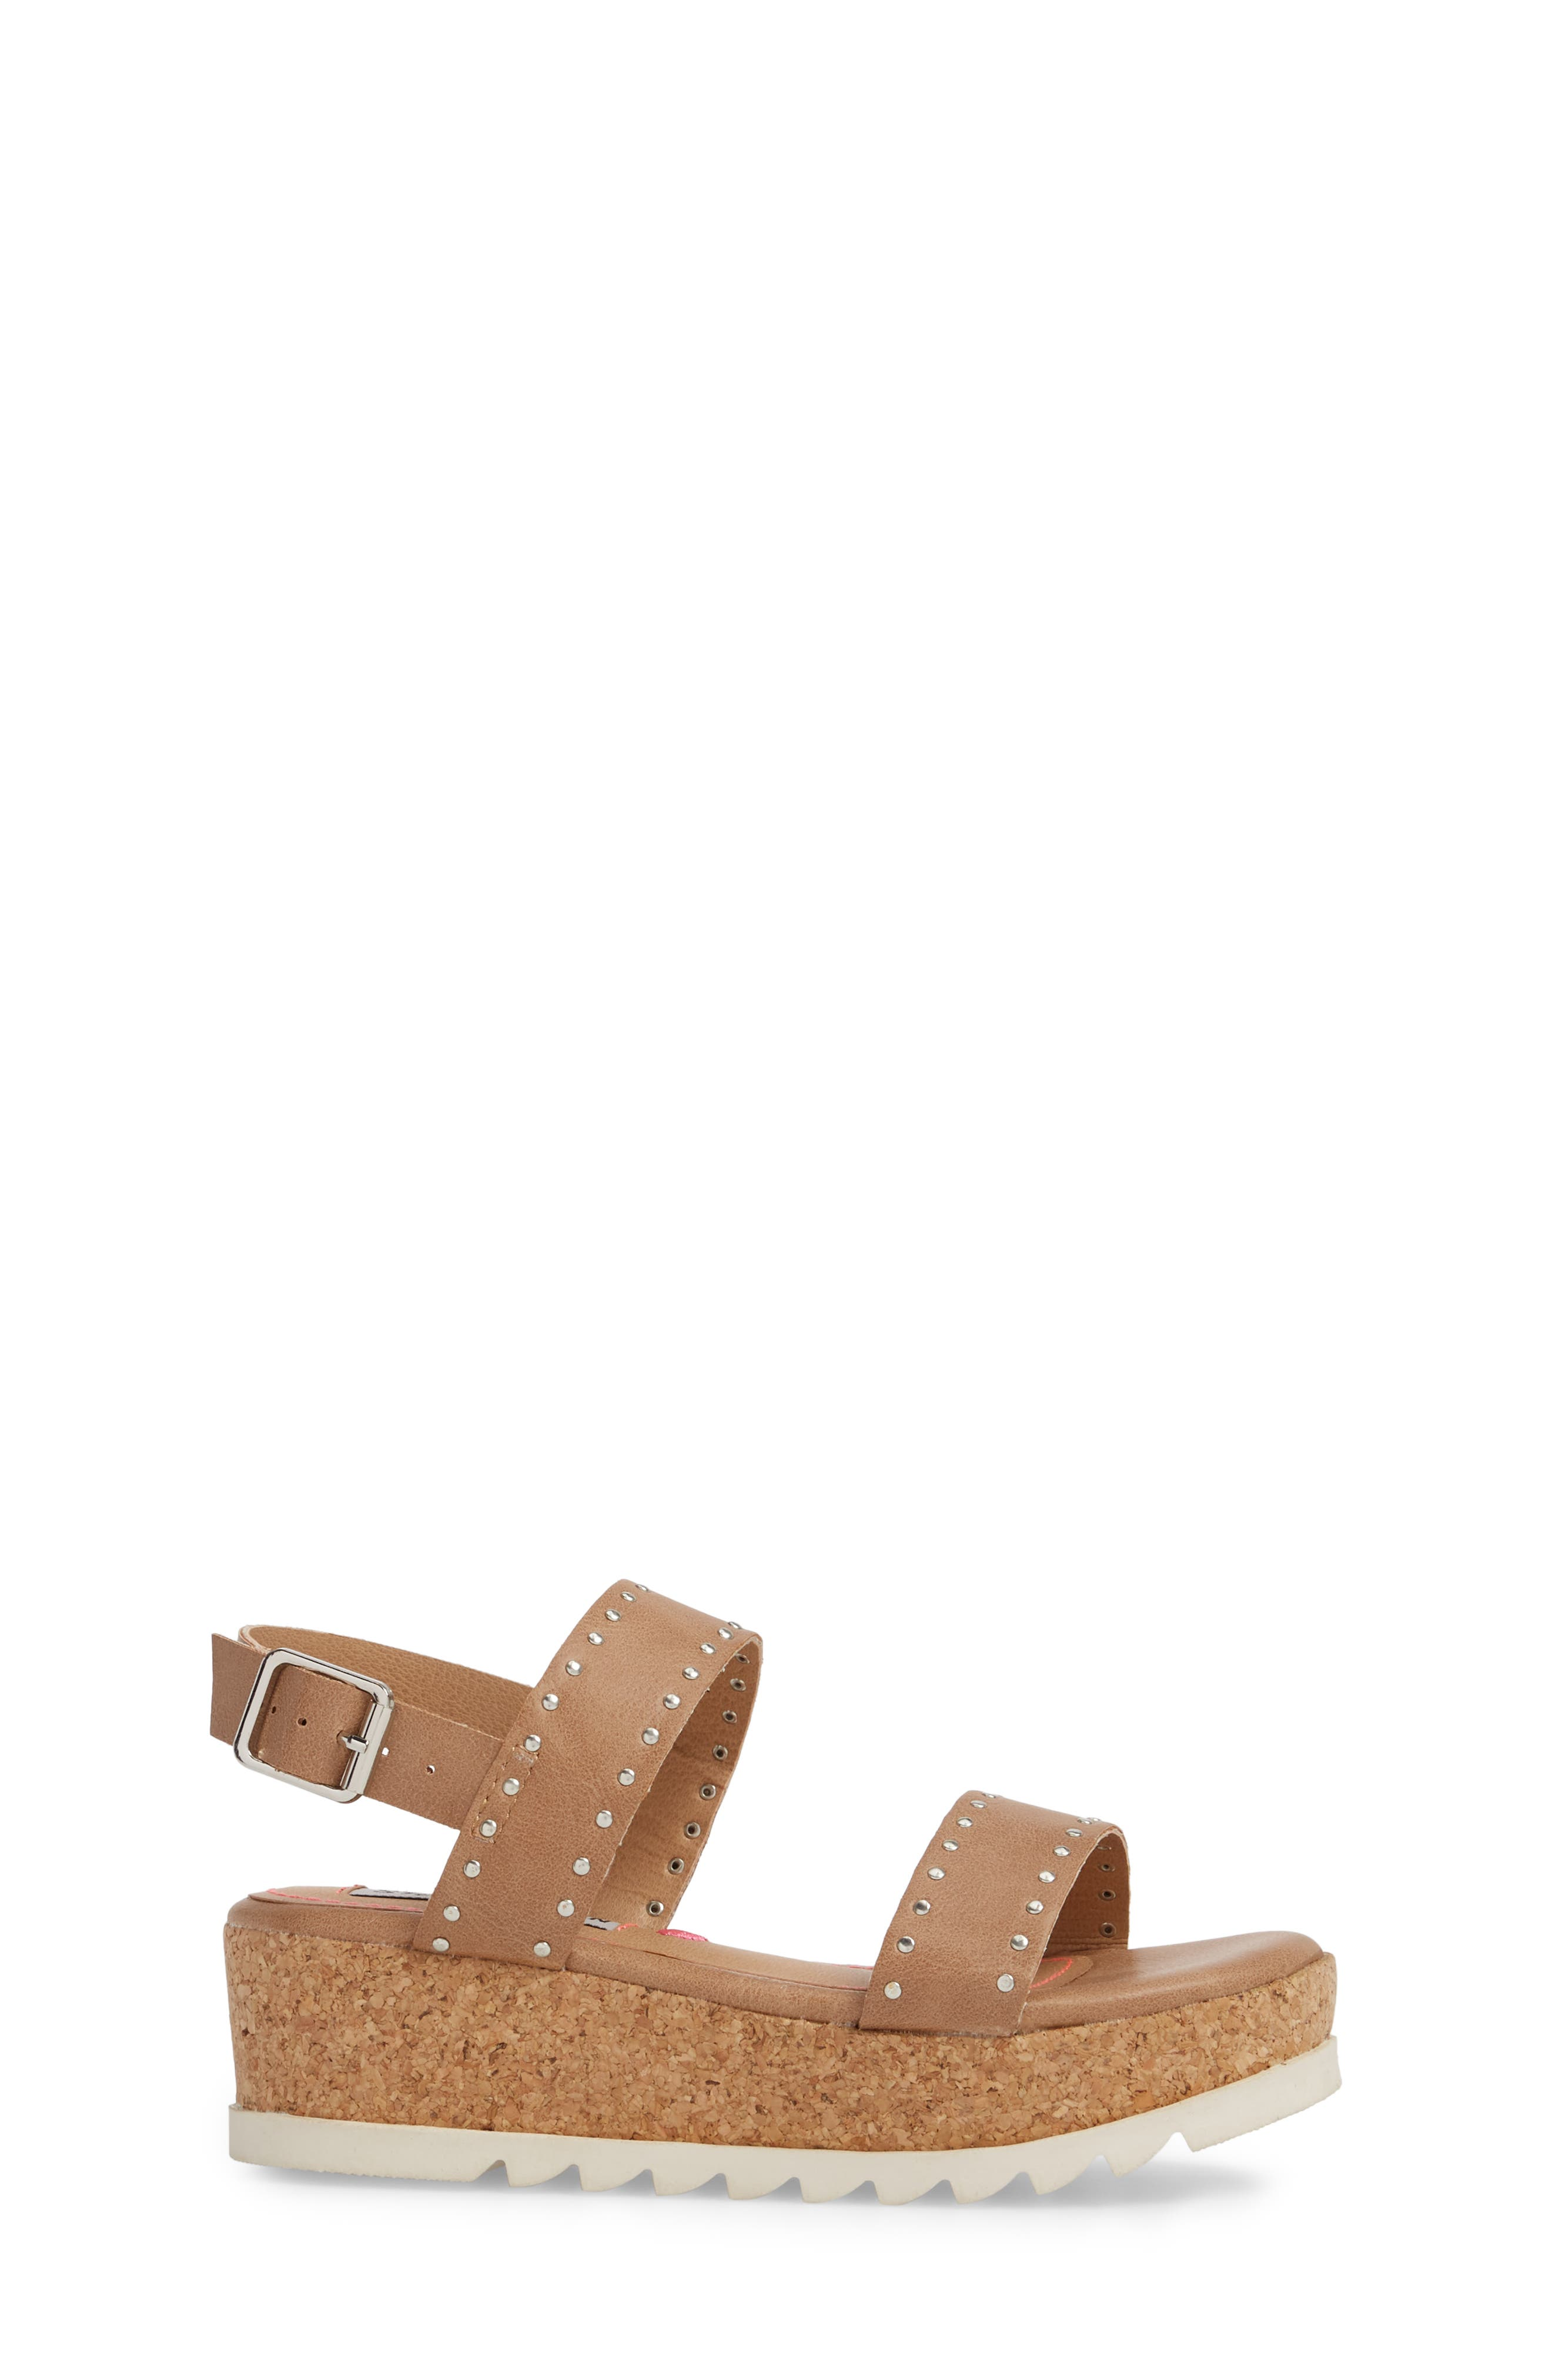 JKRISTIE Platform Sandal,                             Alternate thumbnail 3, color,                             Natural